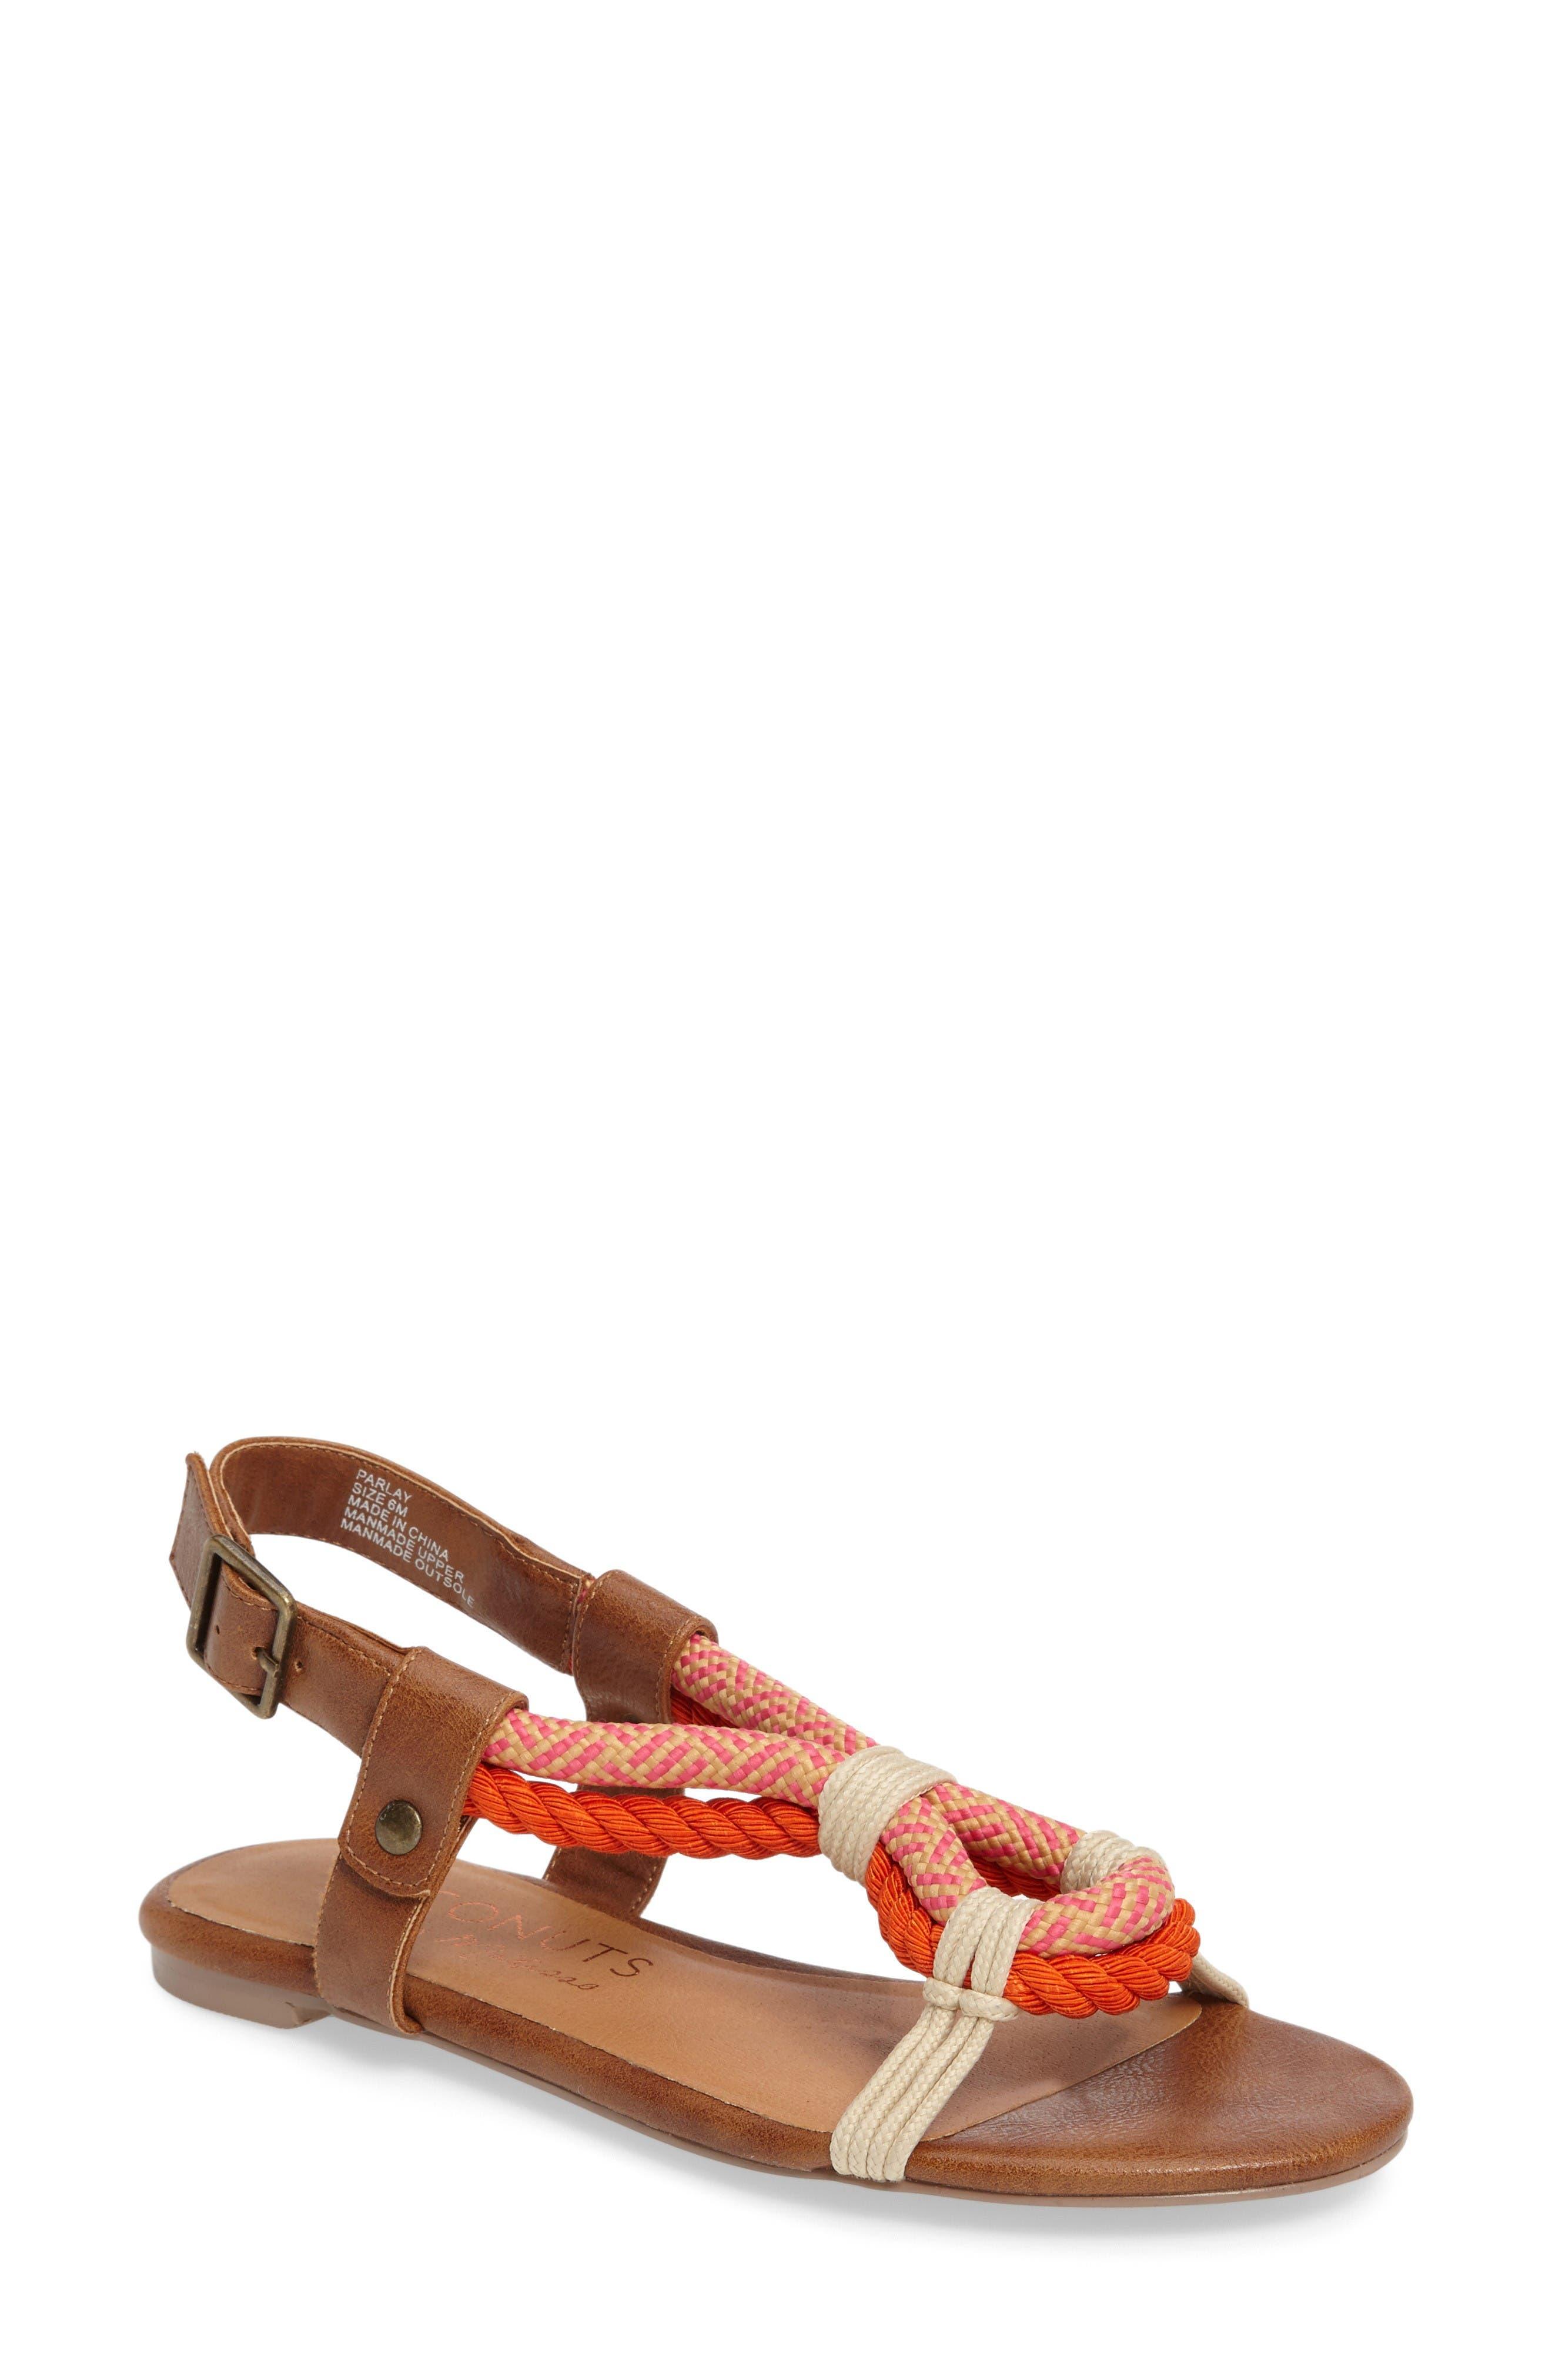 Alternate Image 1 Selected - Matisse Parlay Sandal (Women)